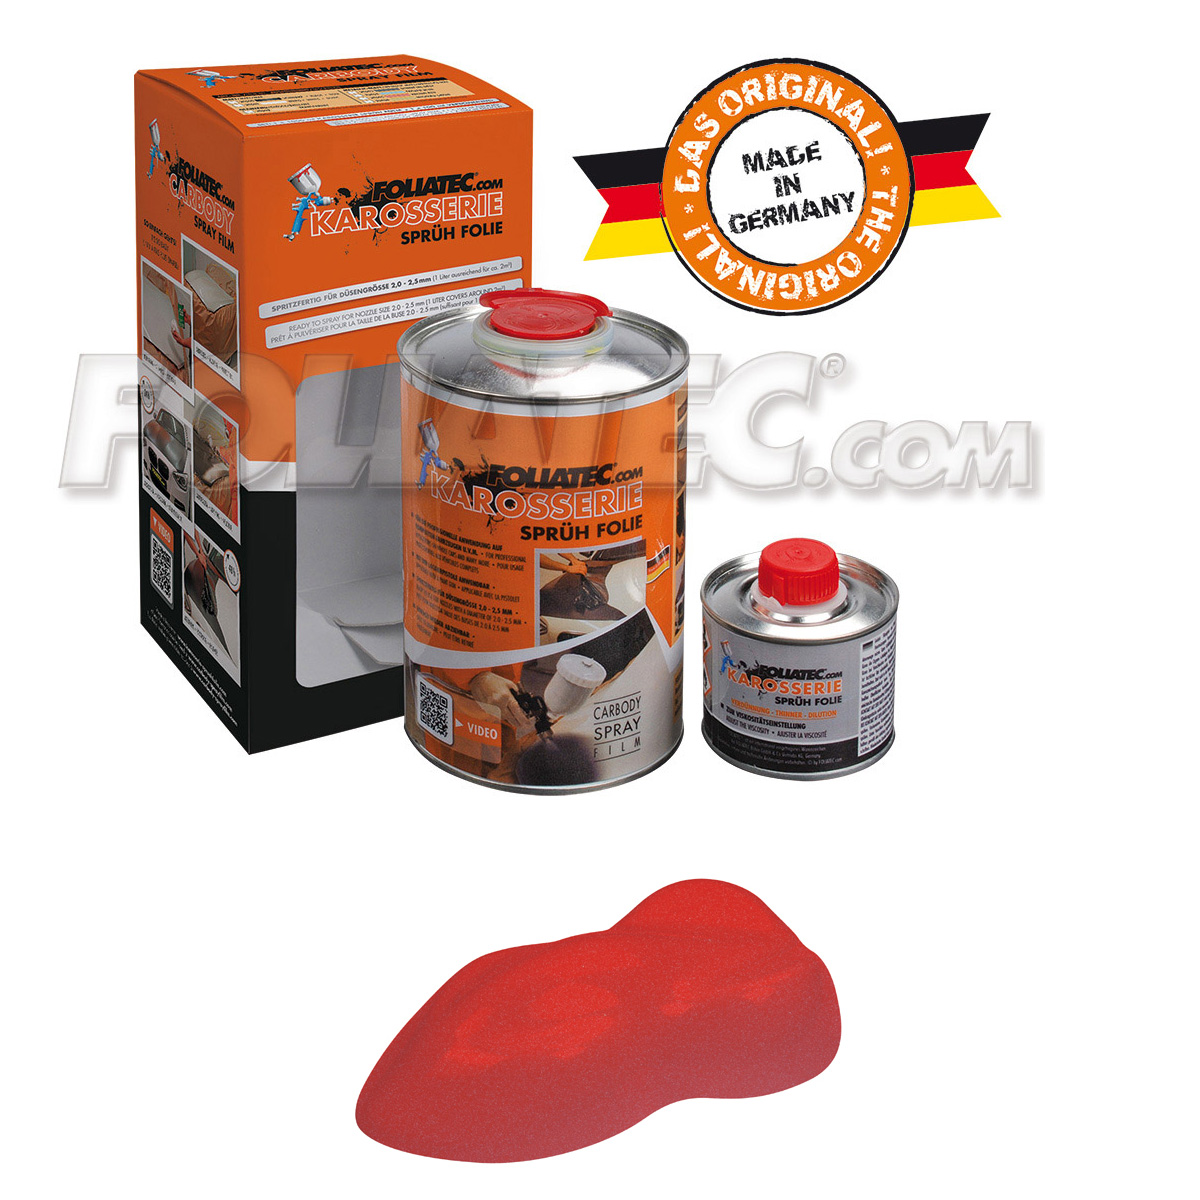 Foliatec Karosseriesprühfolie/Karosserie-Sprühfolie racing red/rossorot matt